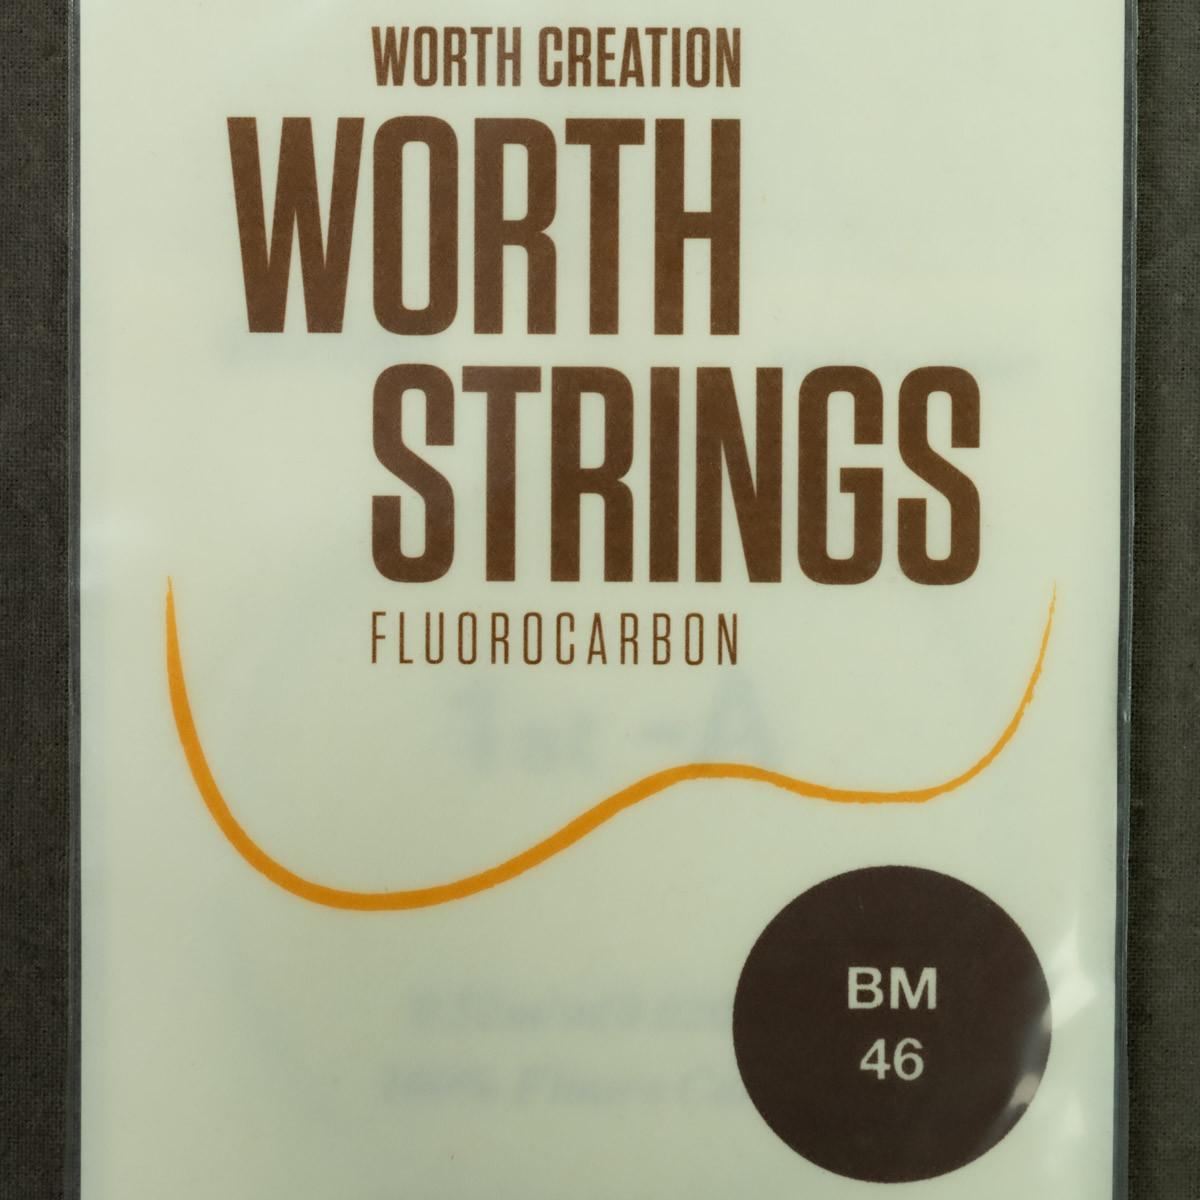 Worth Strings - BM Brown Soprano/Concert High G